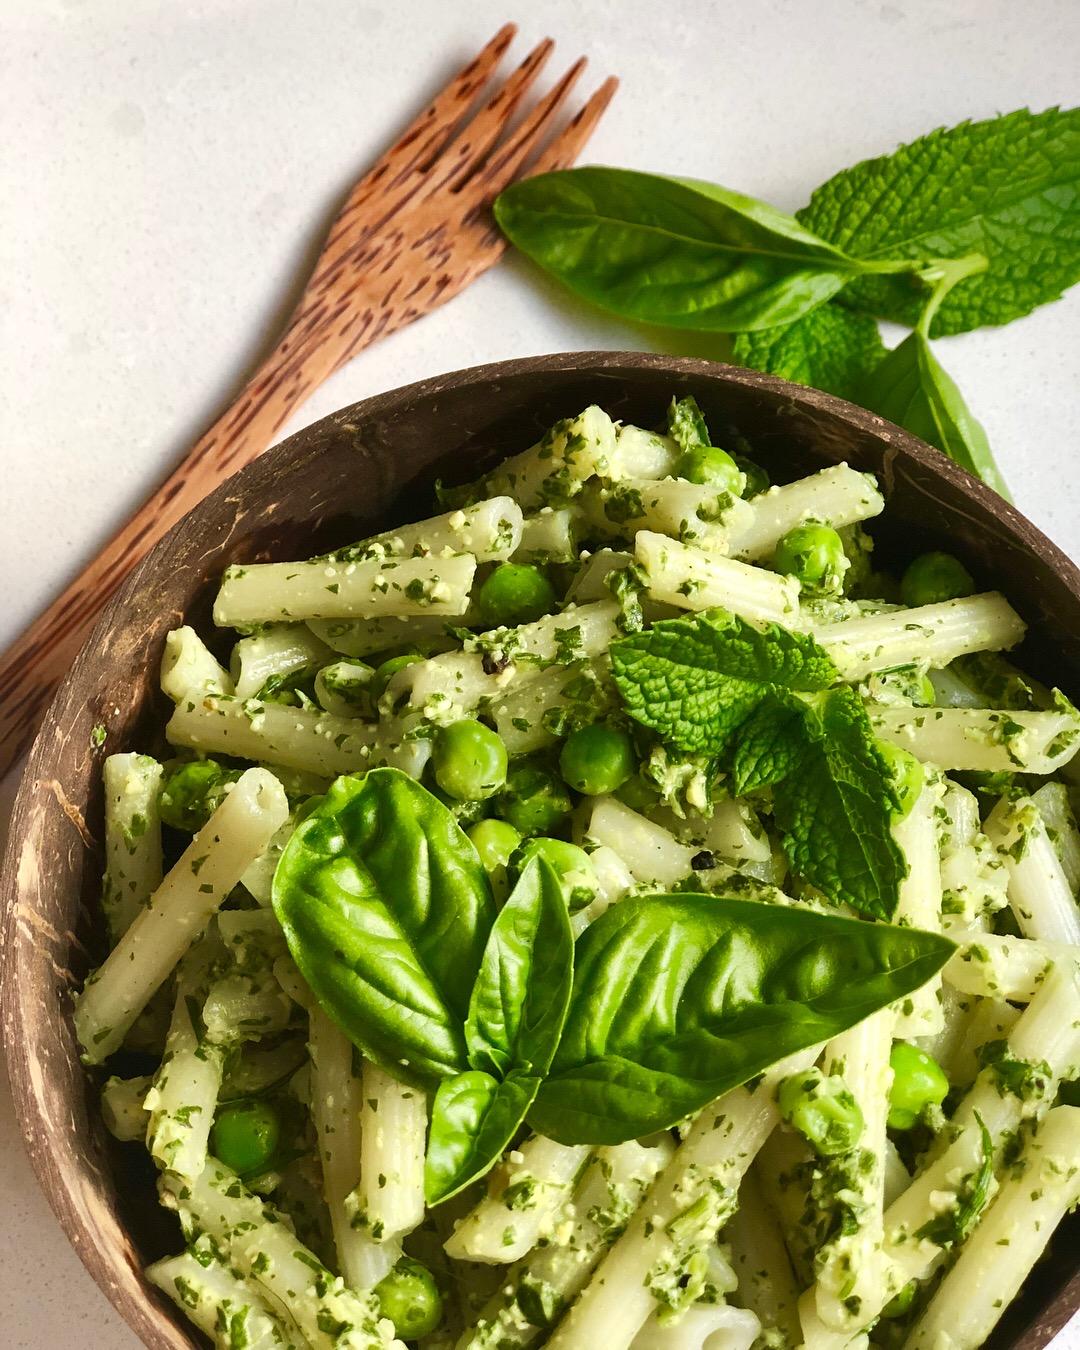 Basil & Mint Pesto Pasta